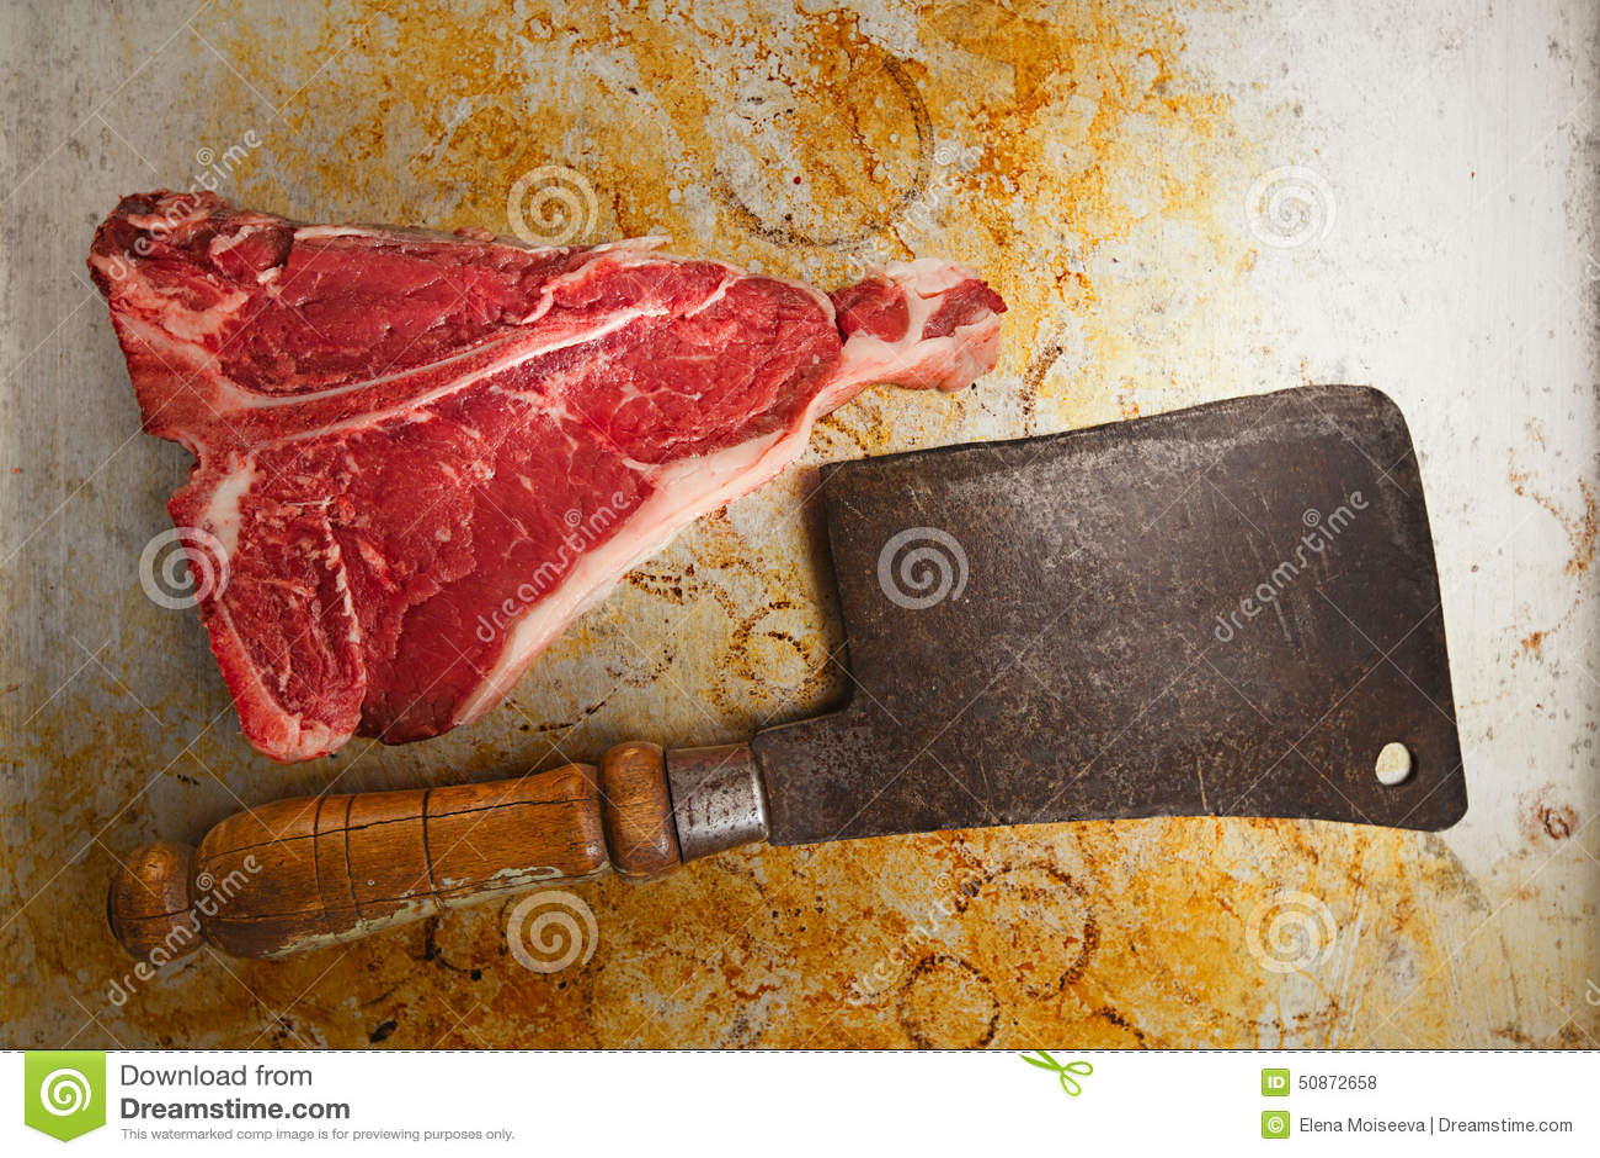 Beef steak t-bone with vintage butcher cleaver knife